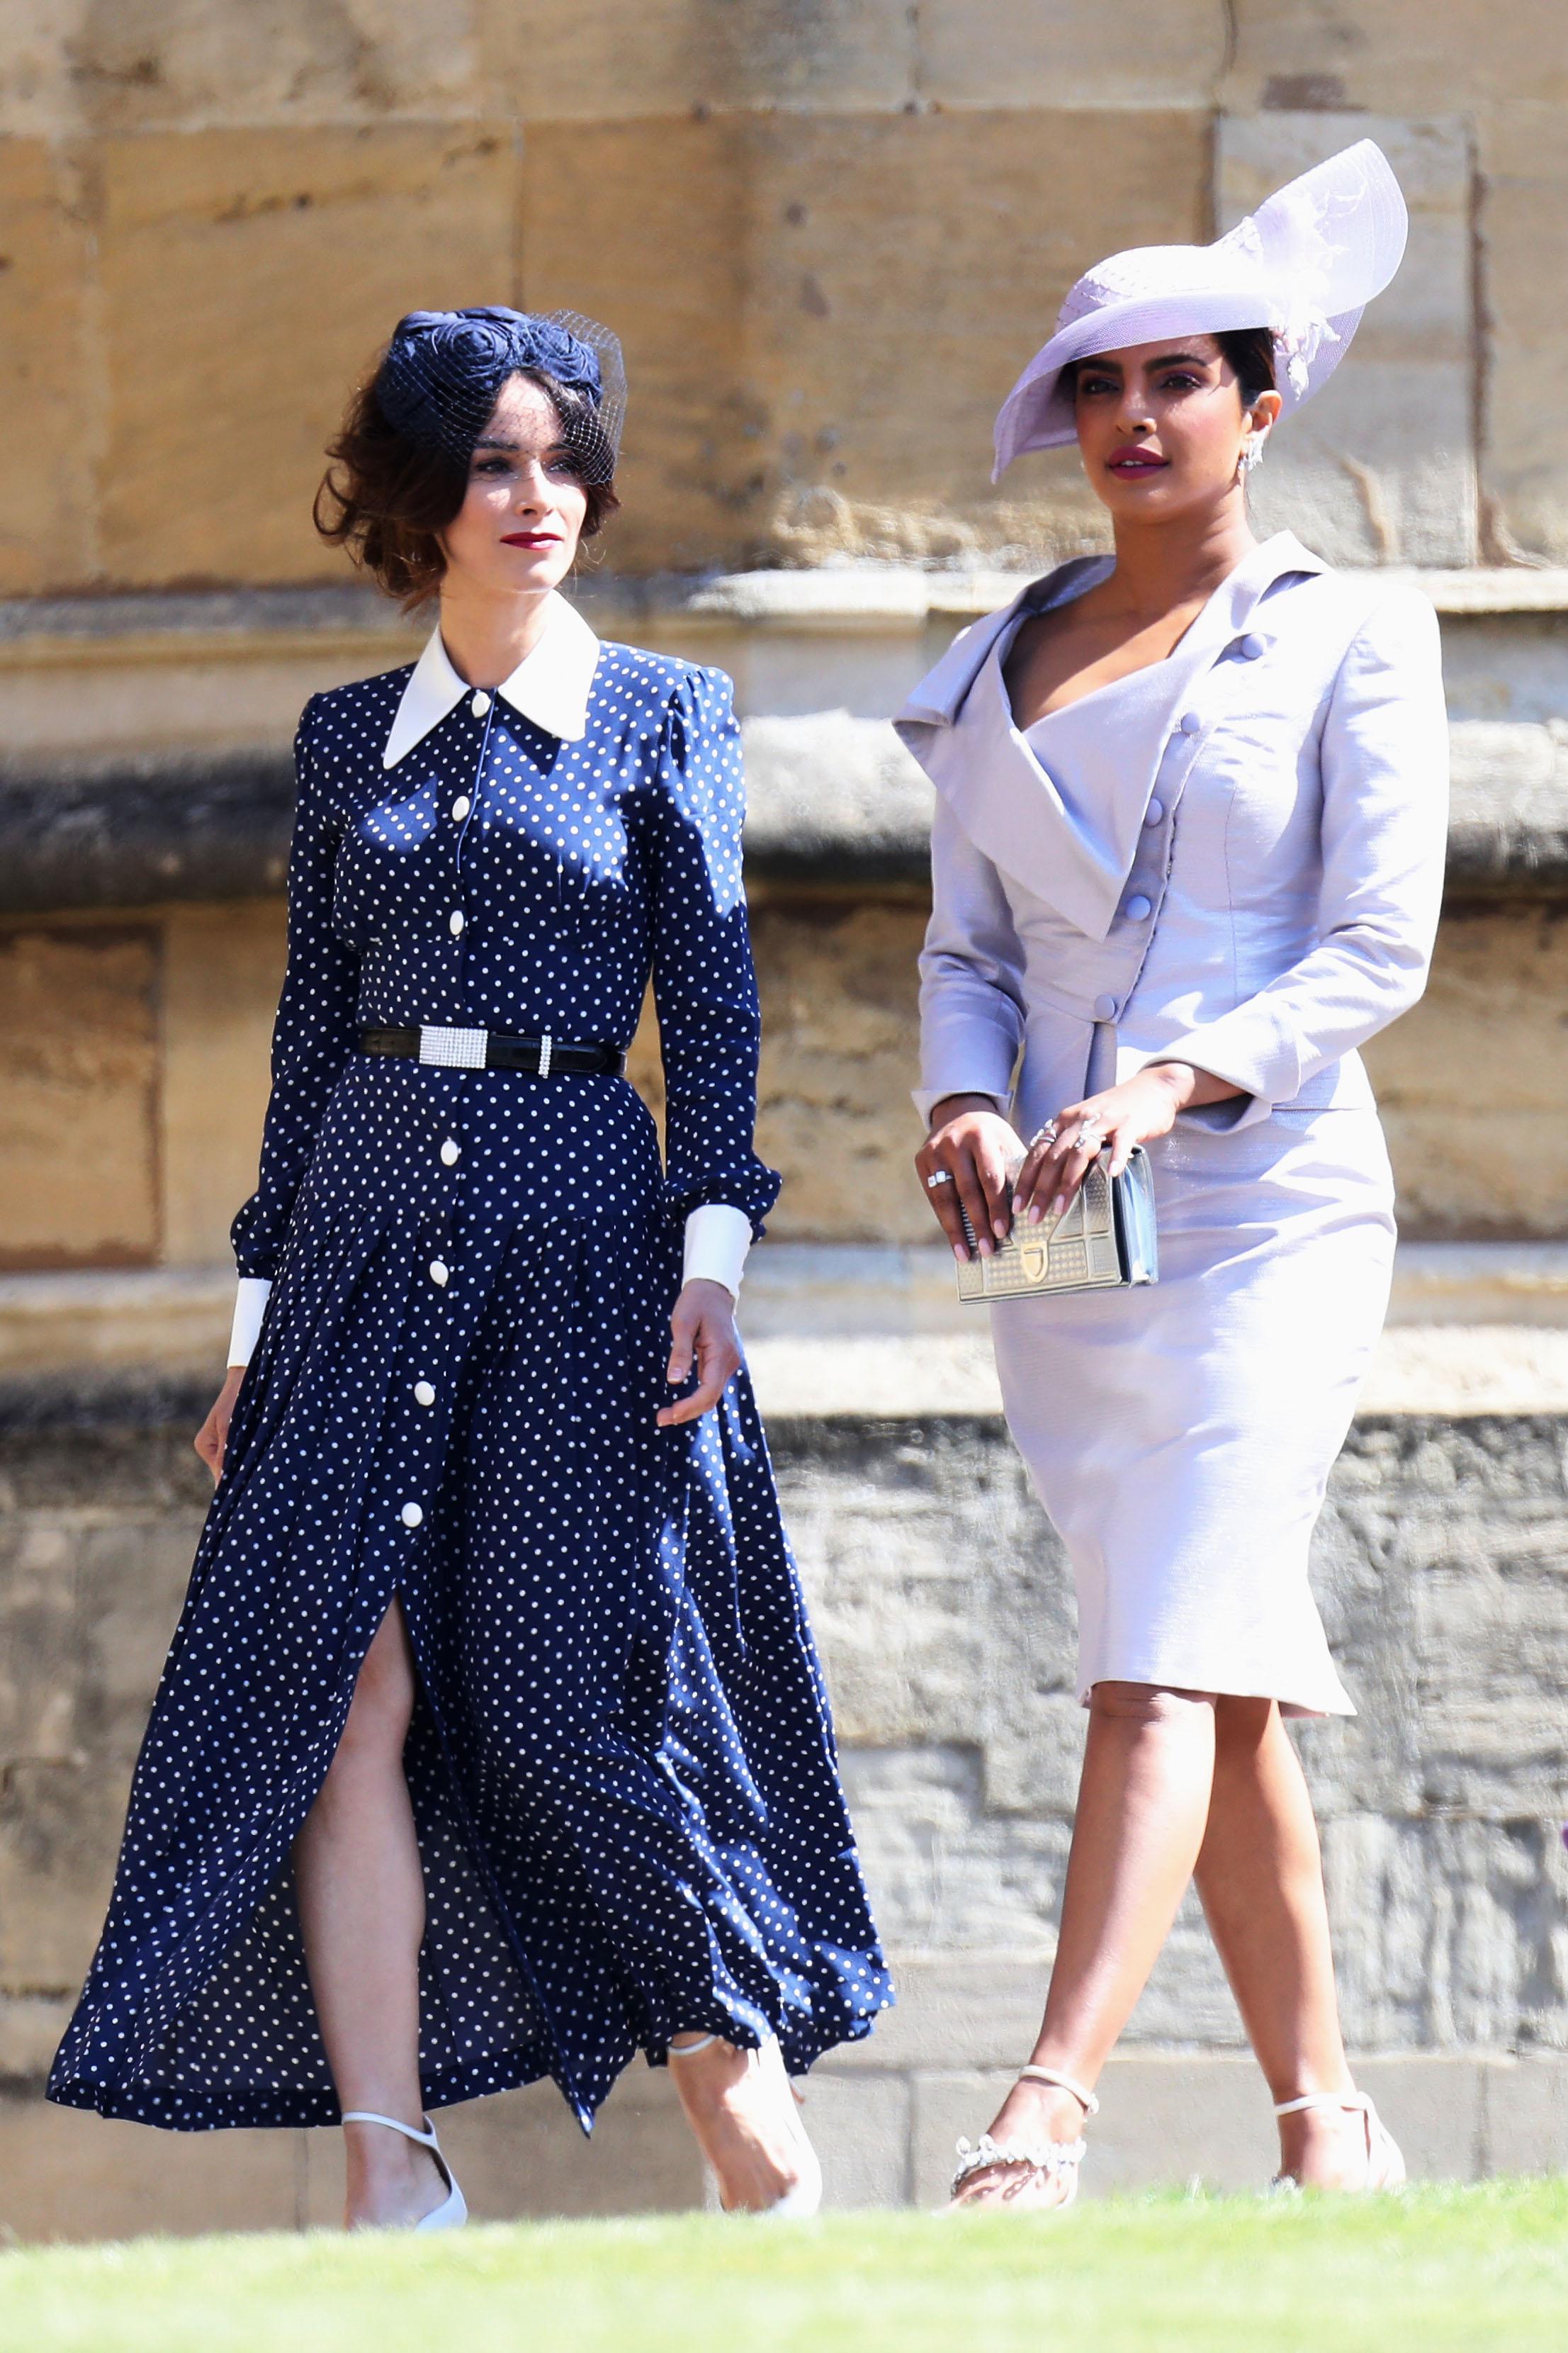 Priyanka Chopra and Abigail Spencer Royal Wedding 2018